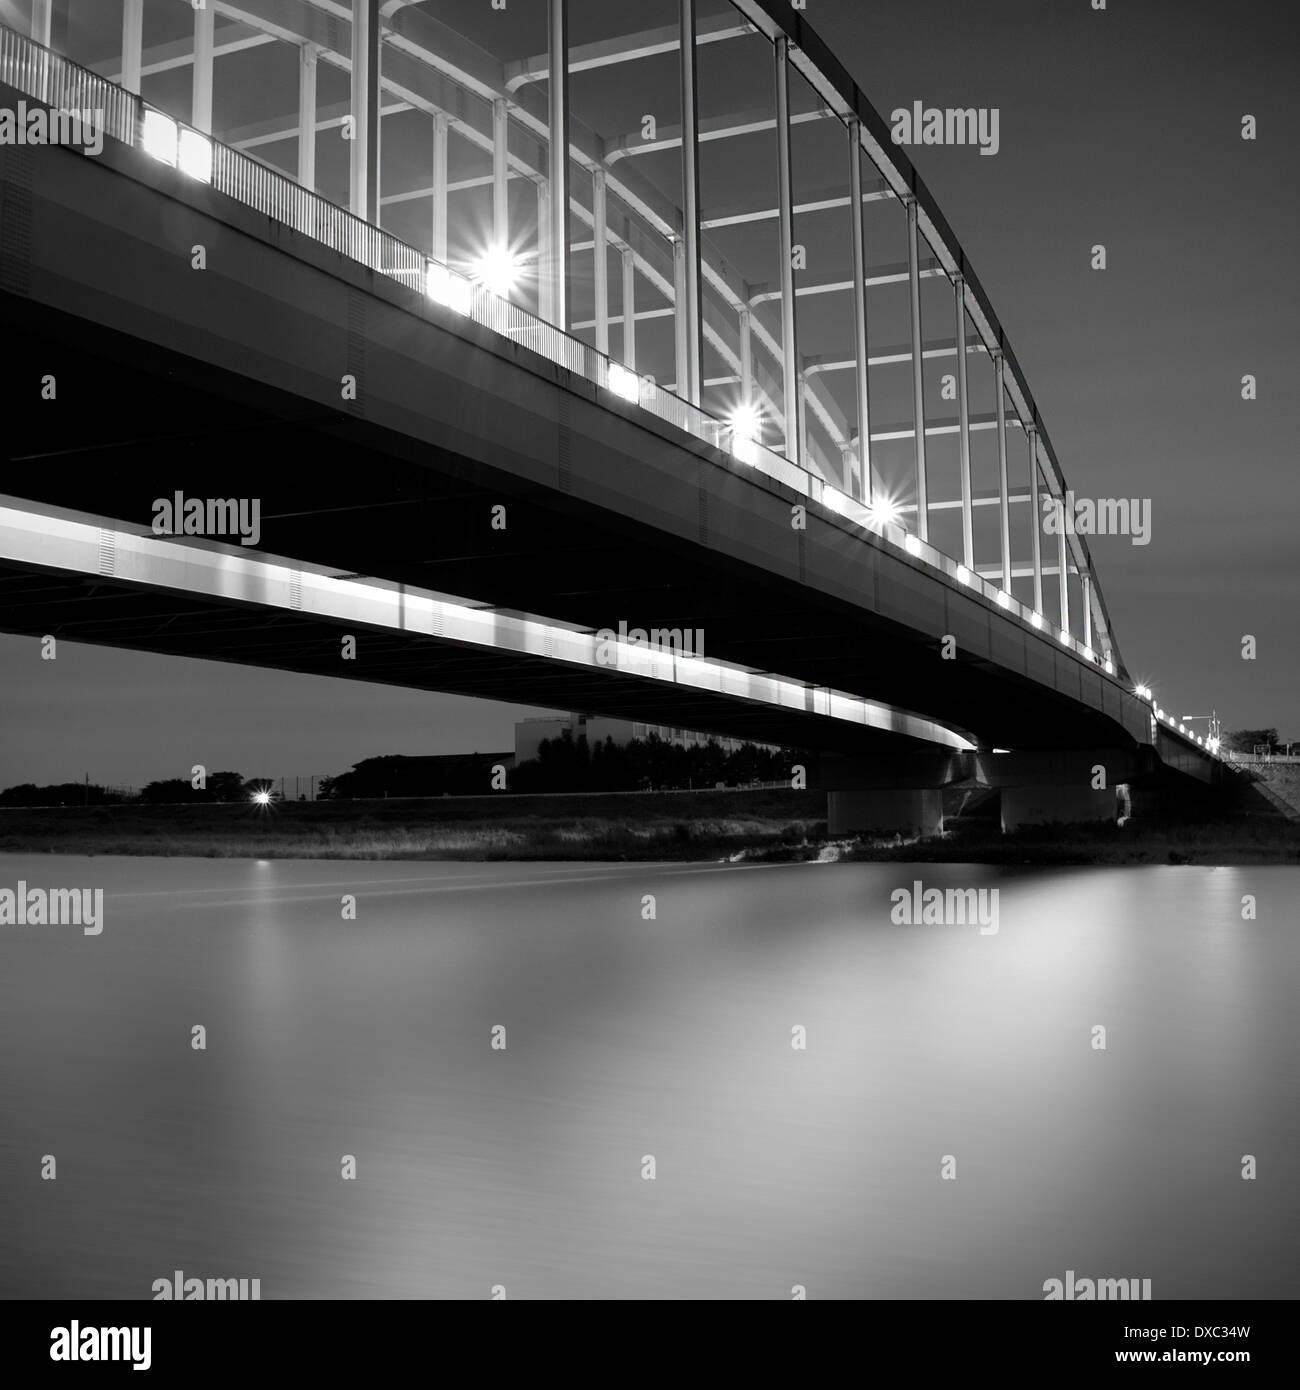 Bridge Over Tama River, Kanagawa Prefecture, Japan - Stock Image